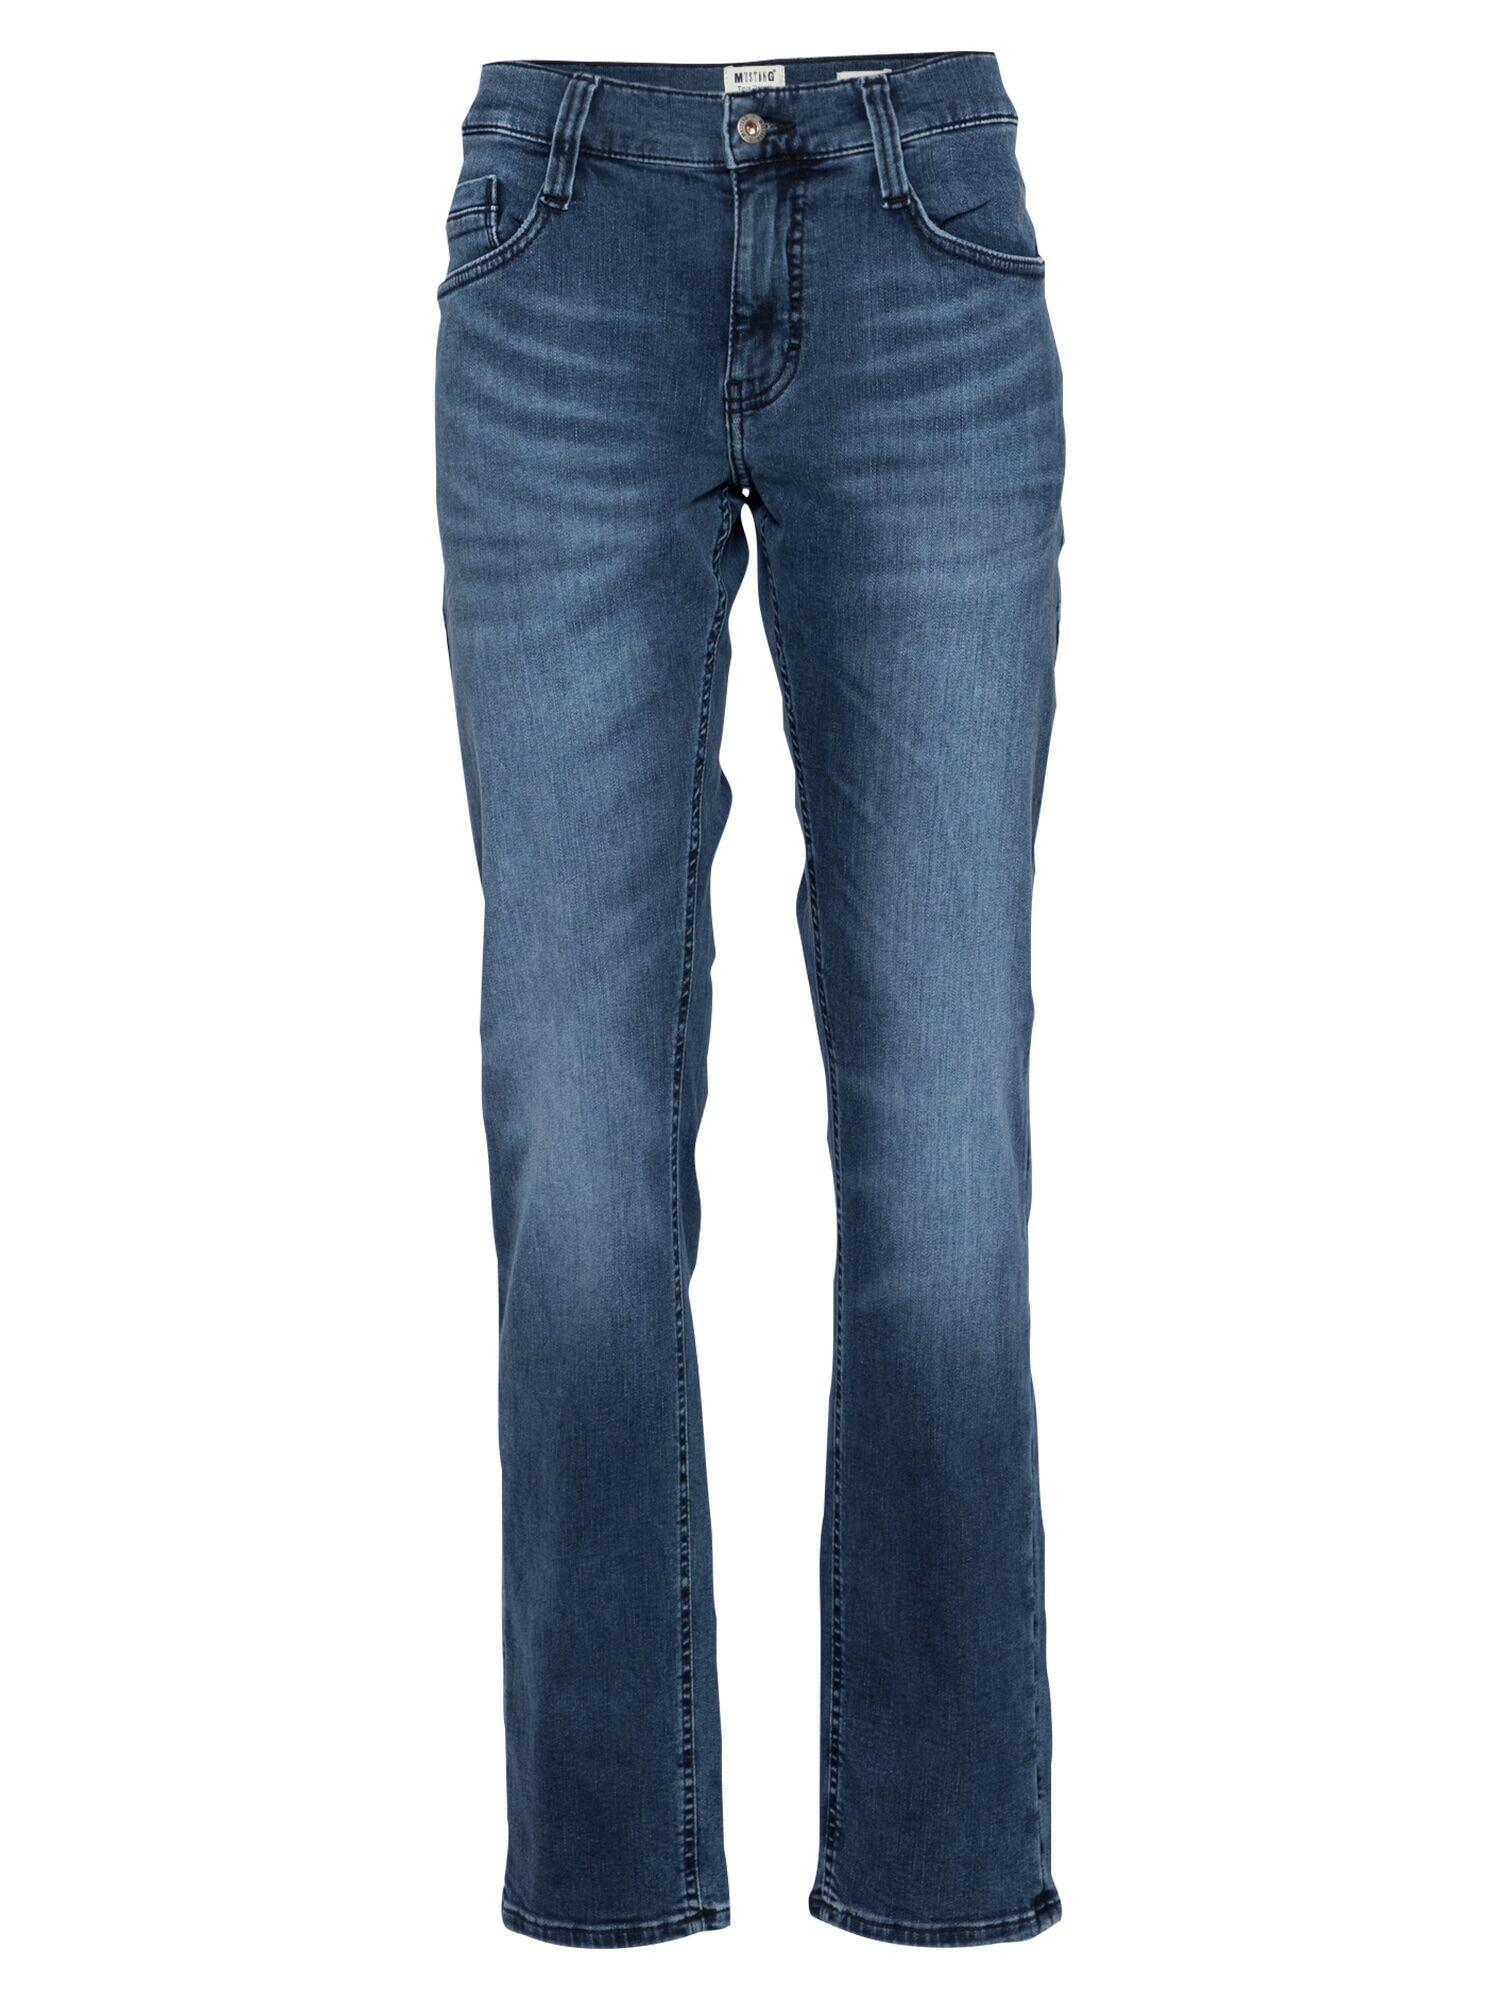 MUSTANG Jean 'Oregon'  - Bleu - Taille: 31/32 - male